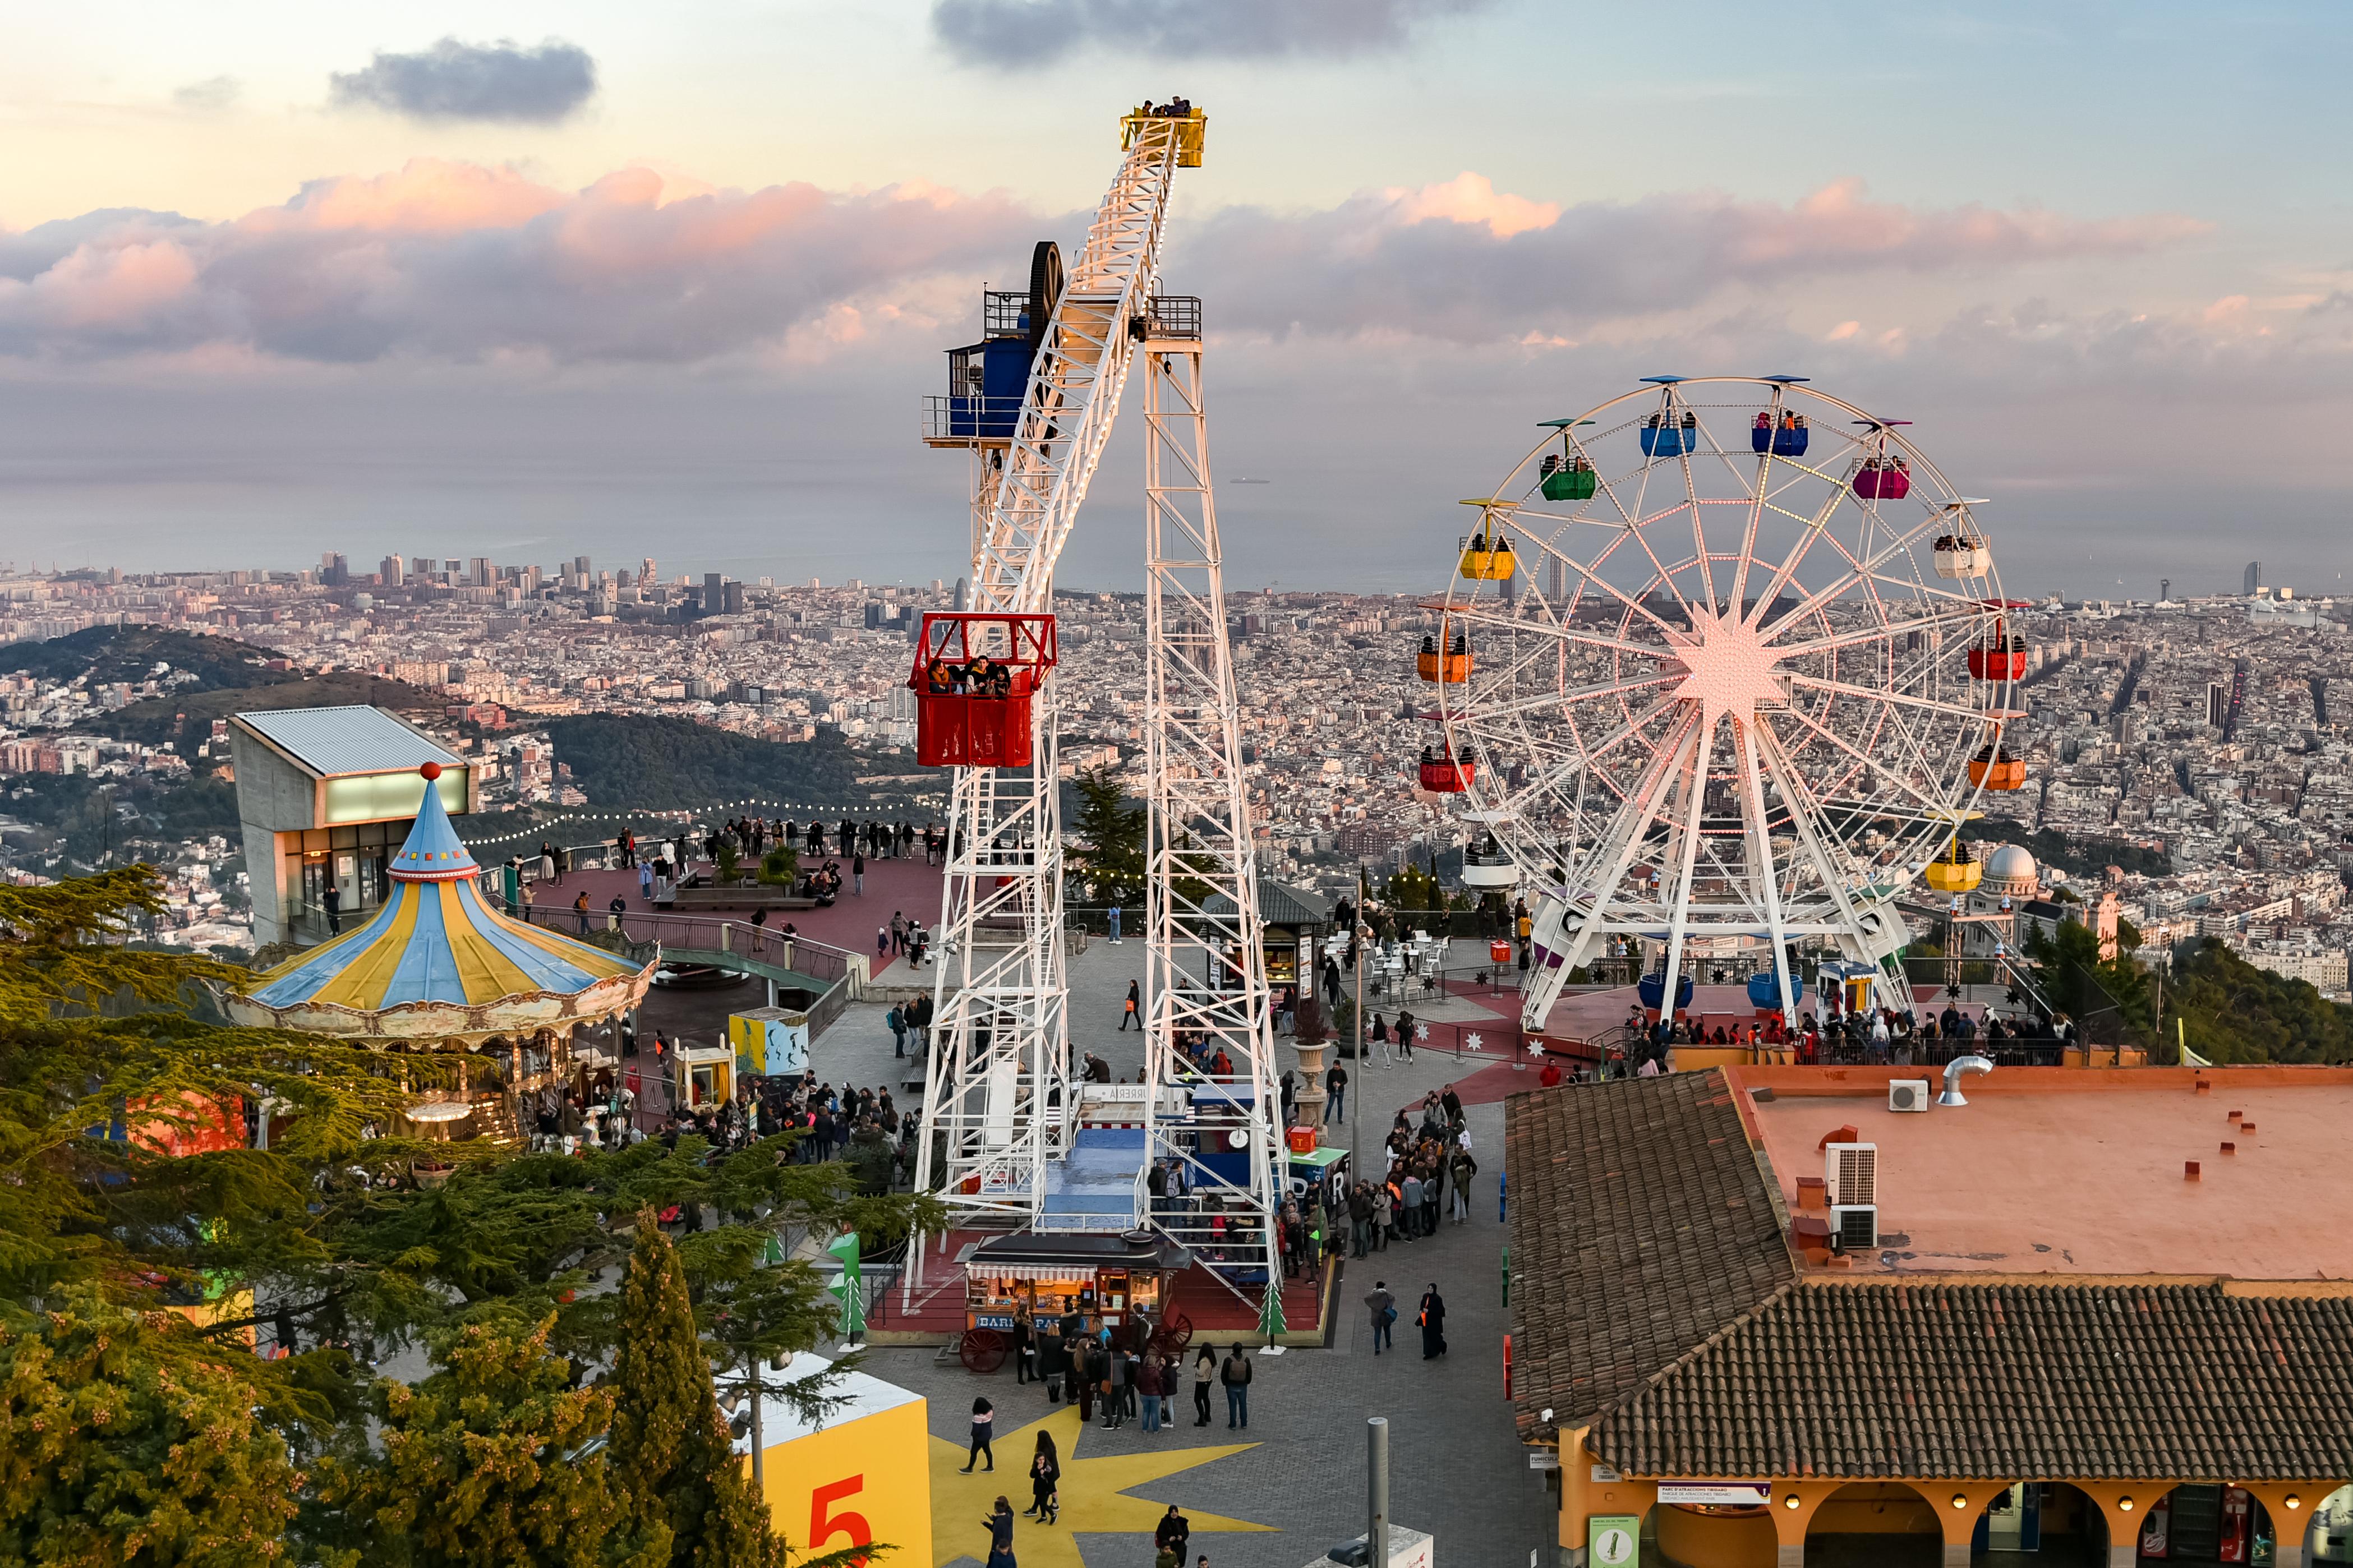 Parc d'Atraccions Tibidabo - 49289536031.jpg